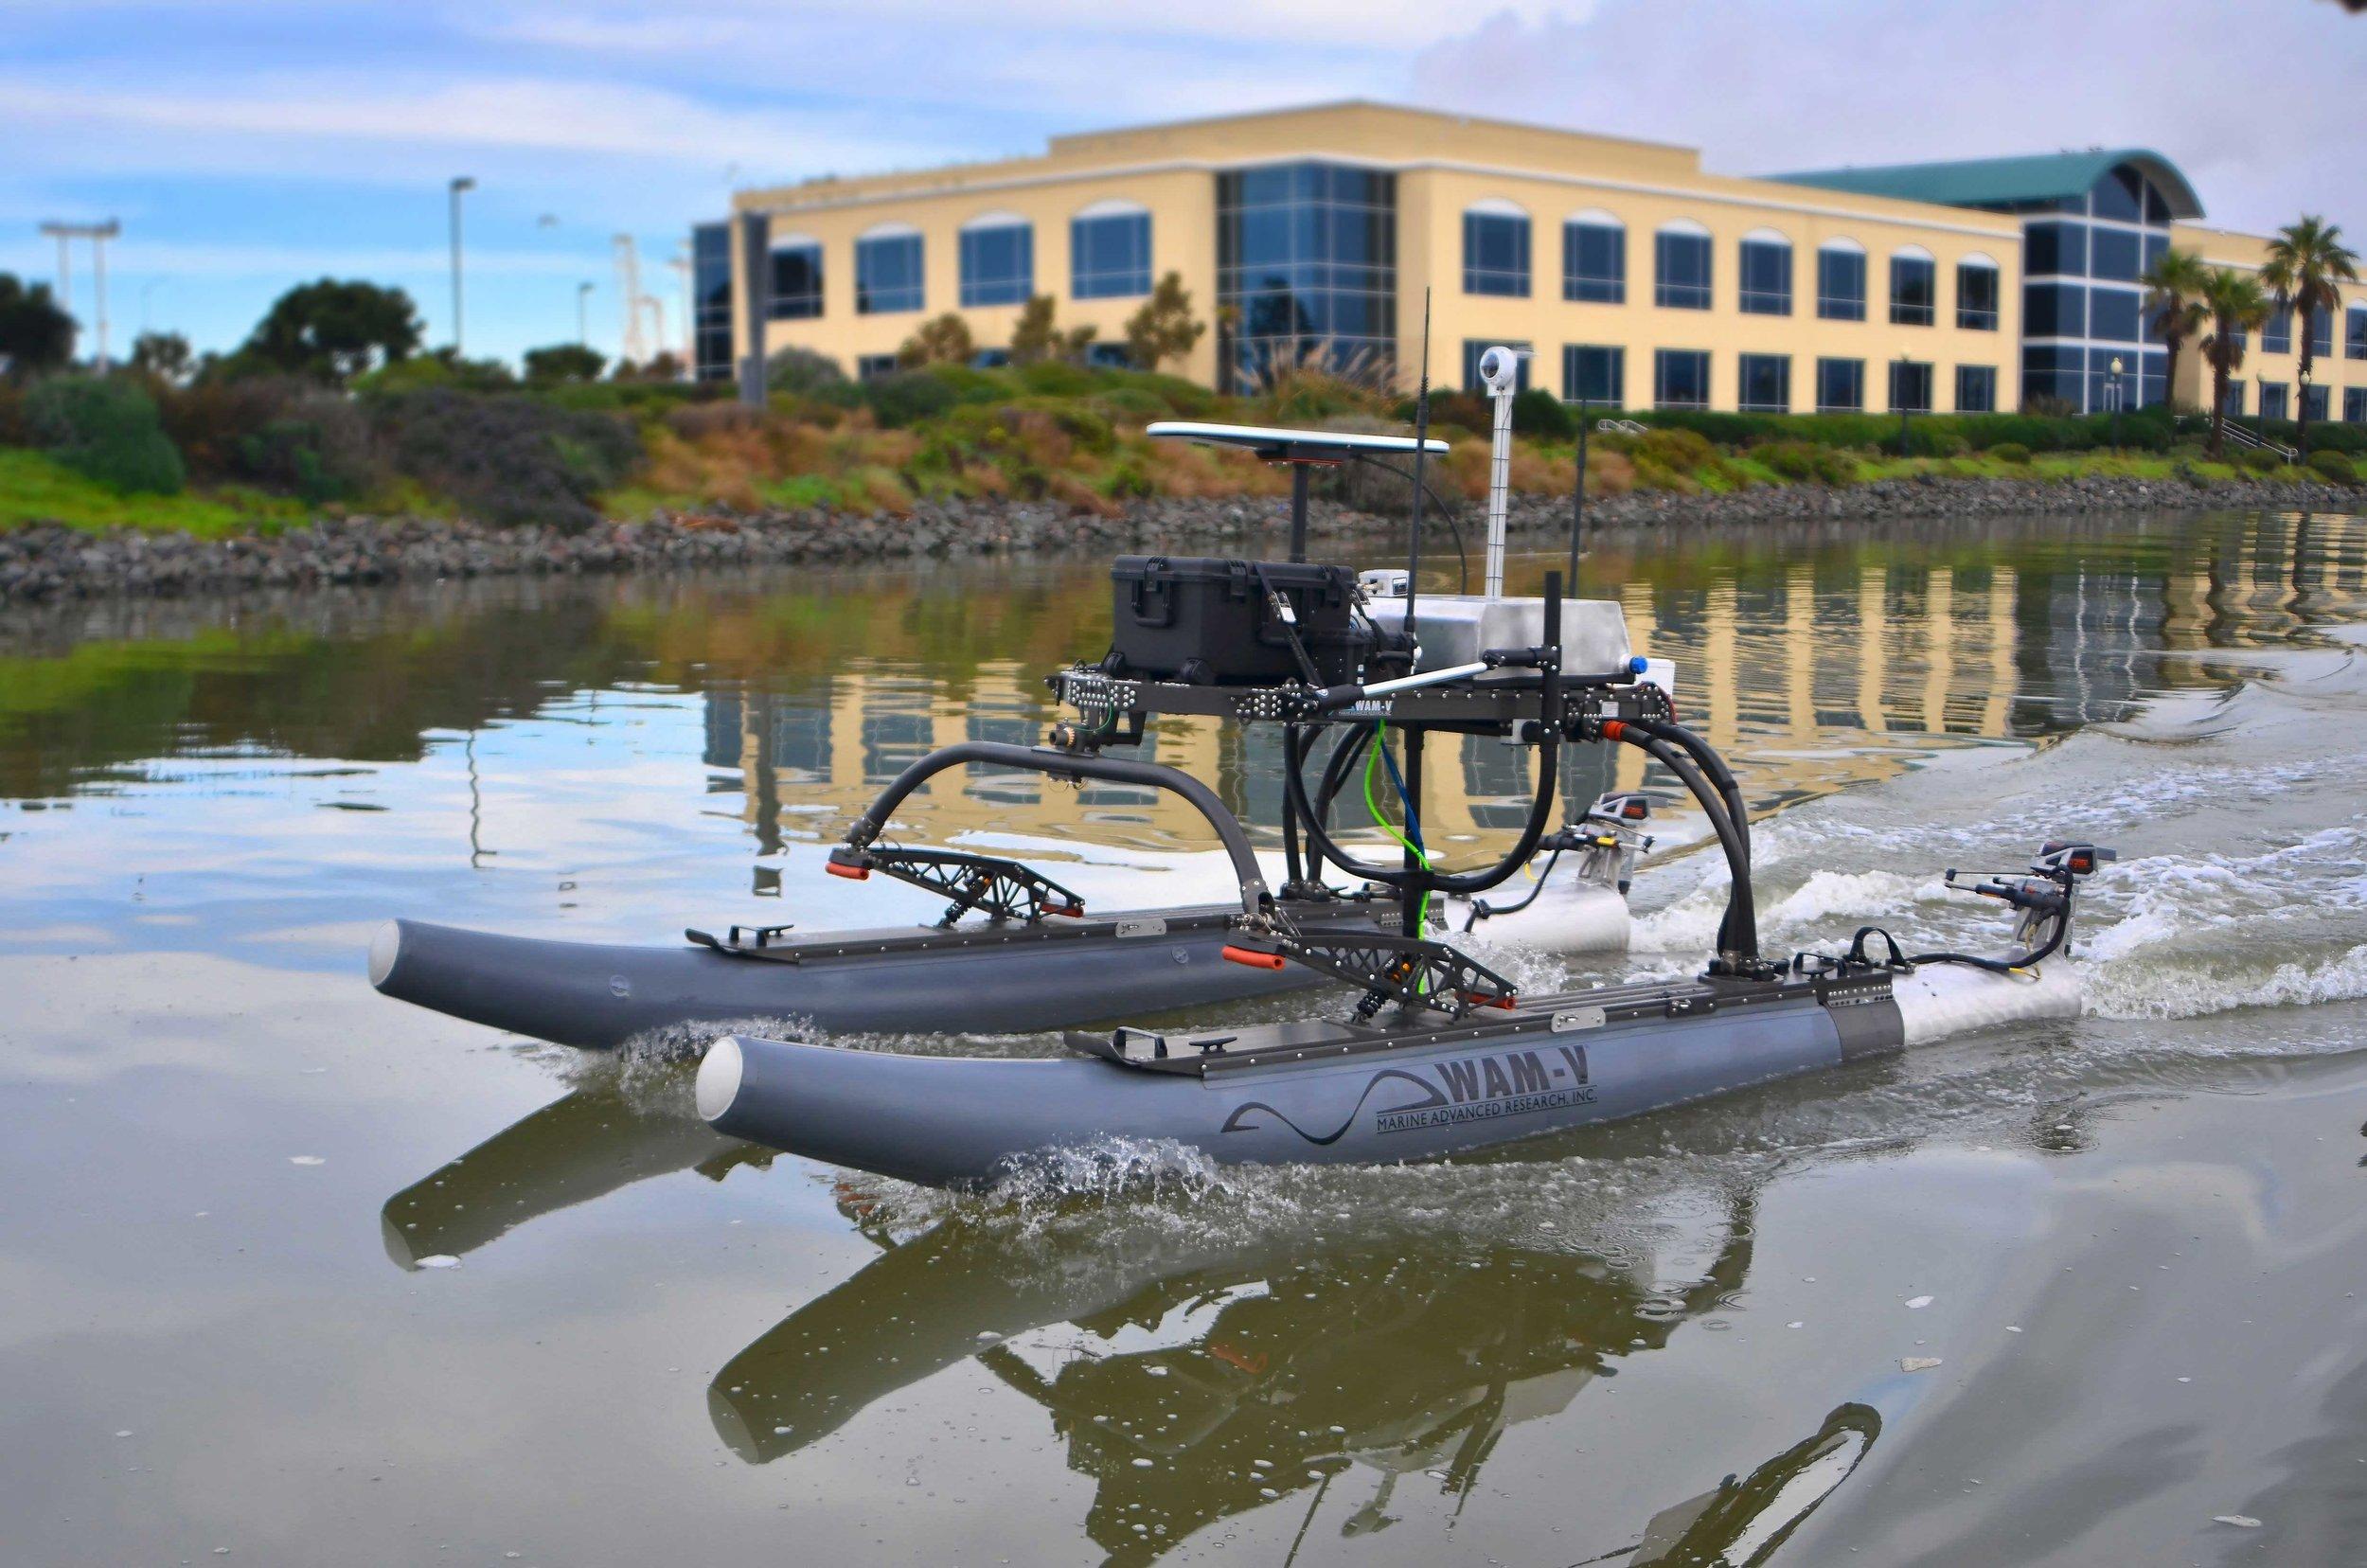 WAM-V 16 ASV for Marine Geotechnical Survey